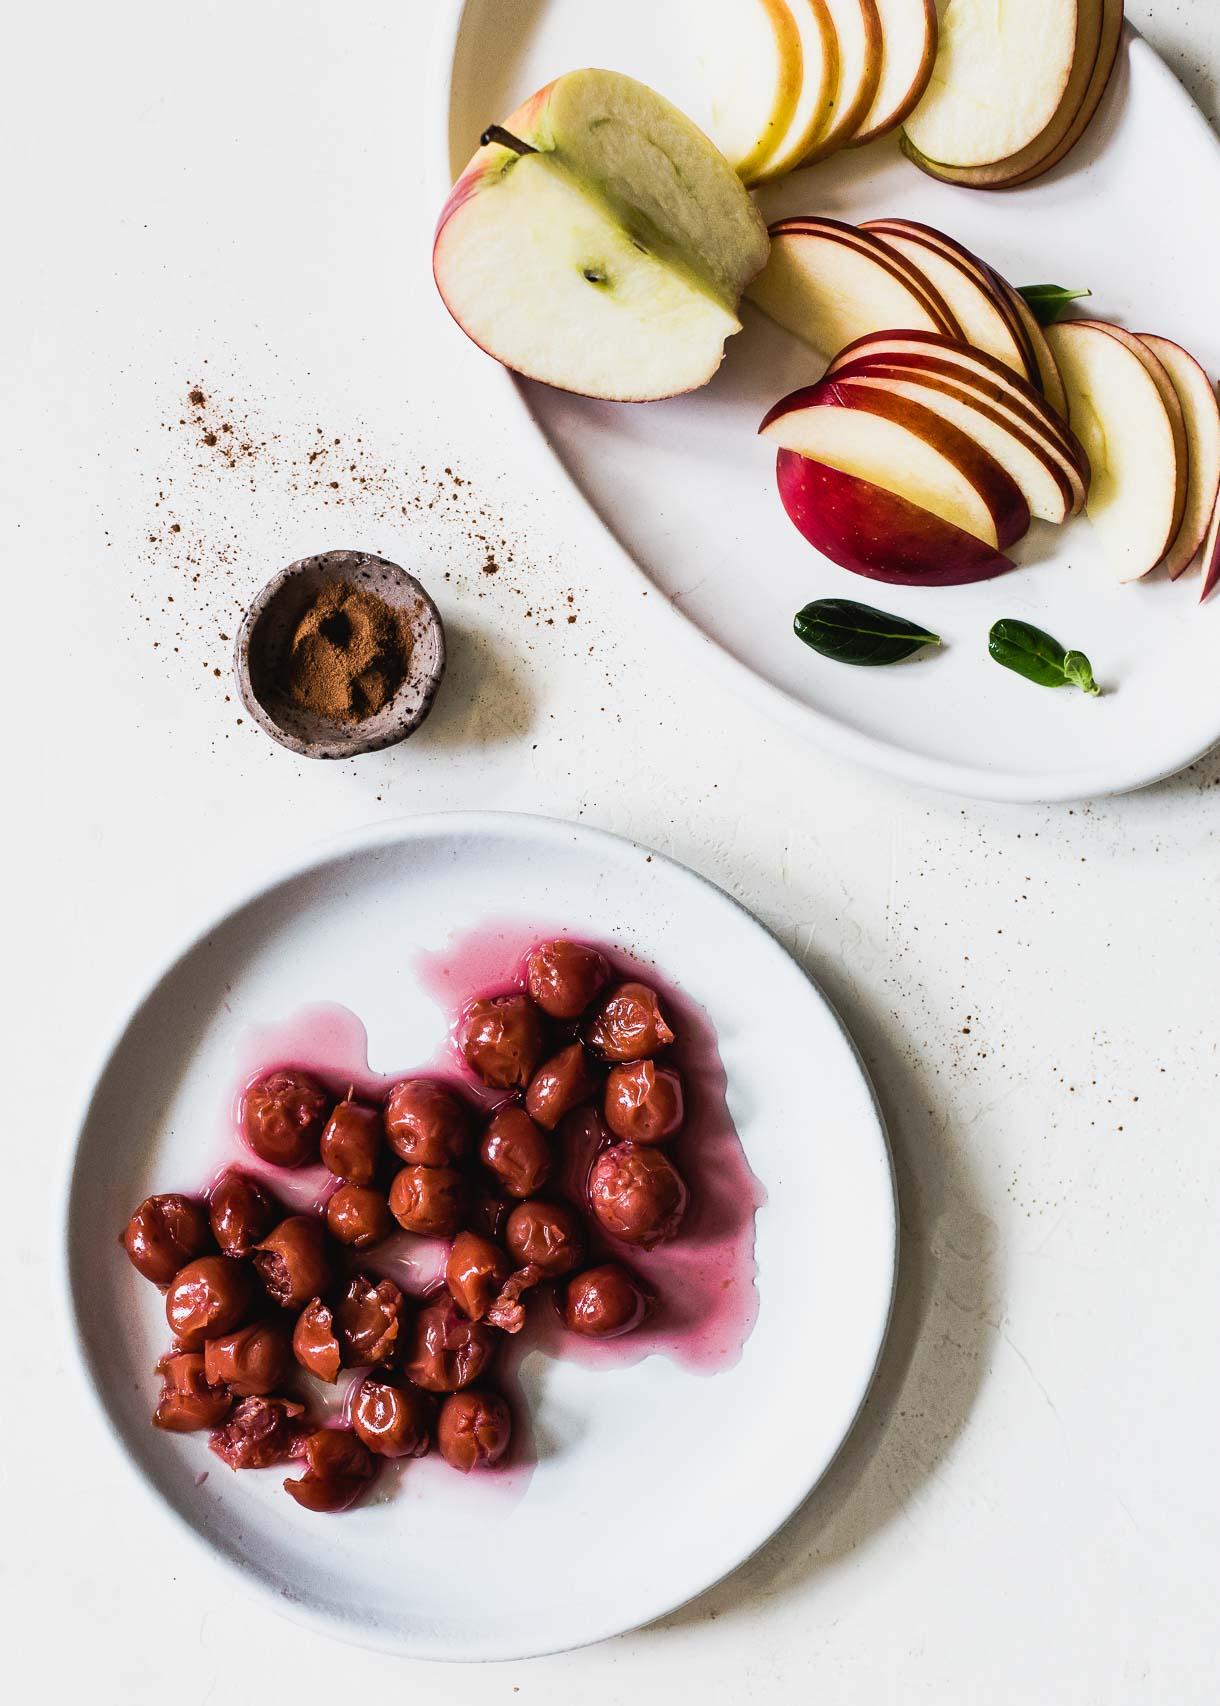 Tart Cherries and Apples